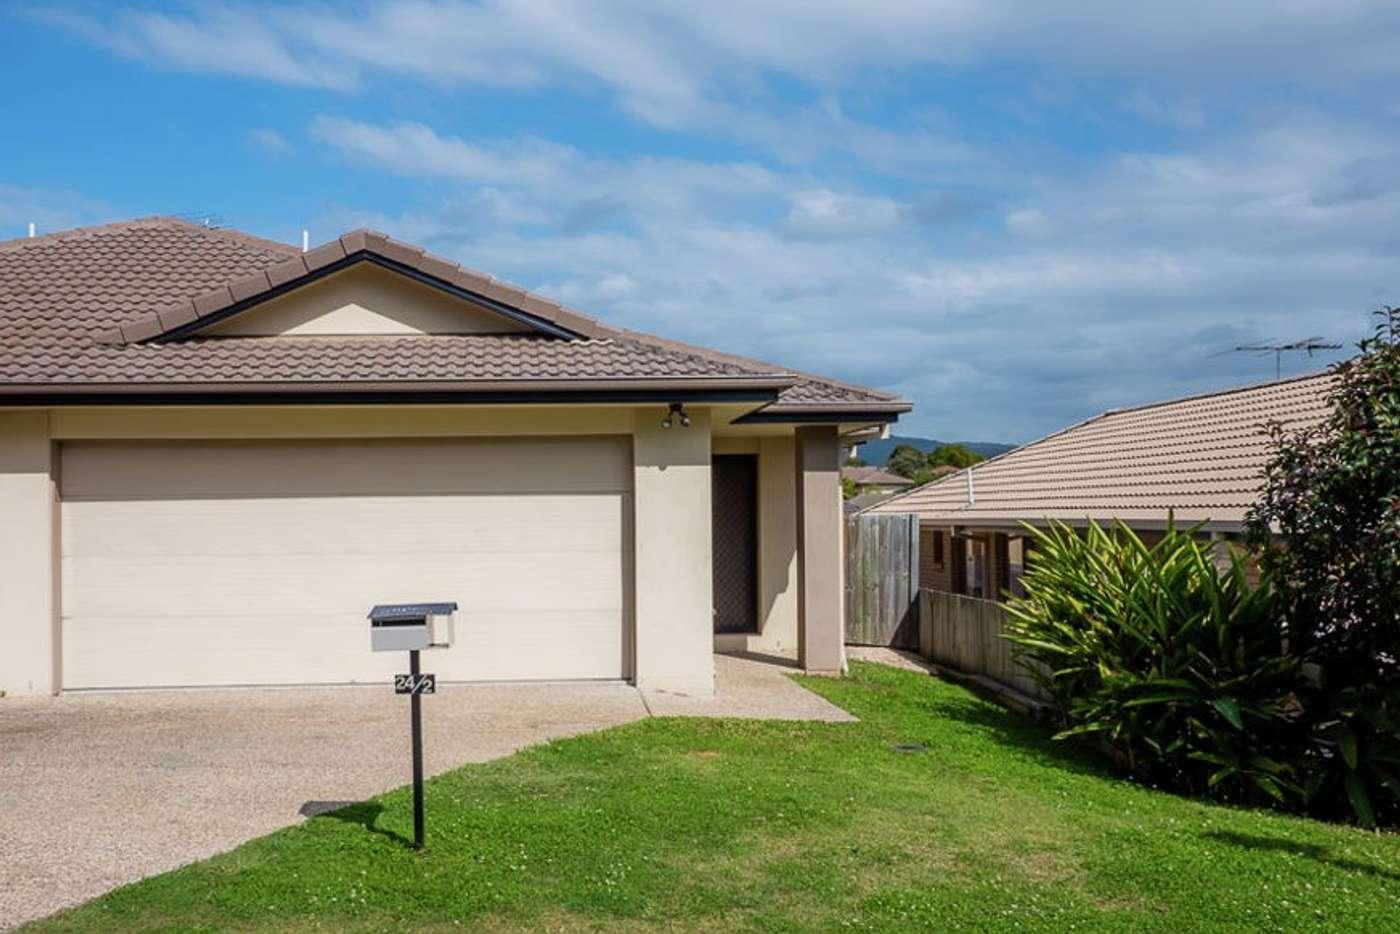 Main view of Homely semiDetached listing, 2/24 Armani Avenue, Pimpama QLD 4209